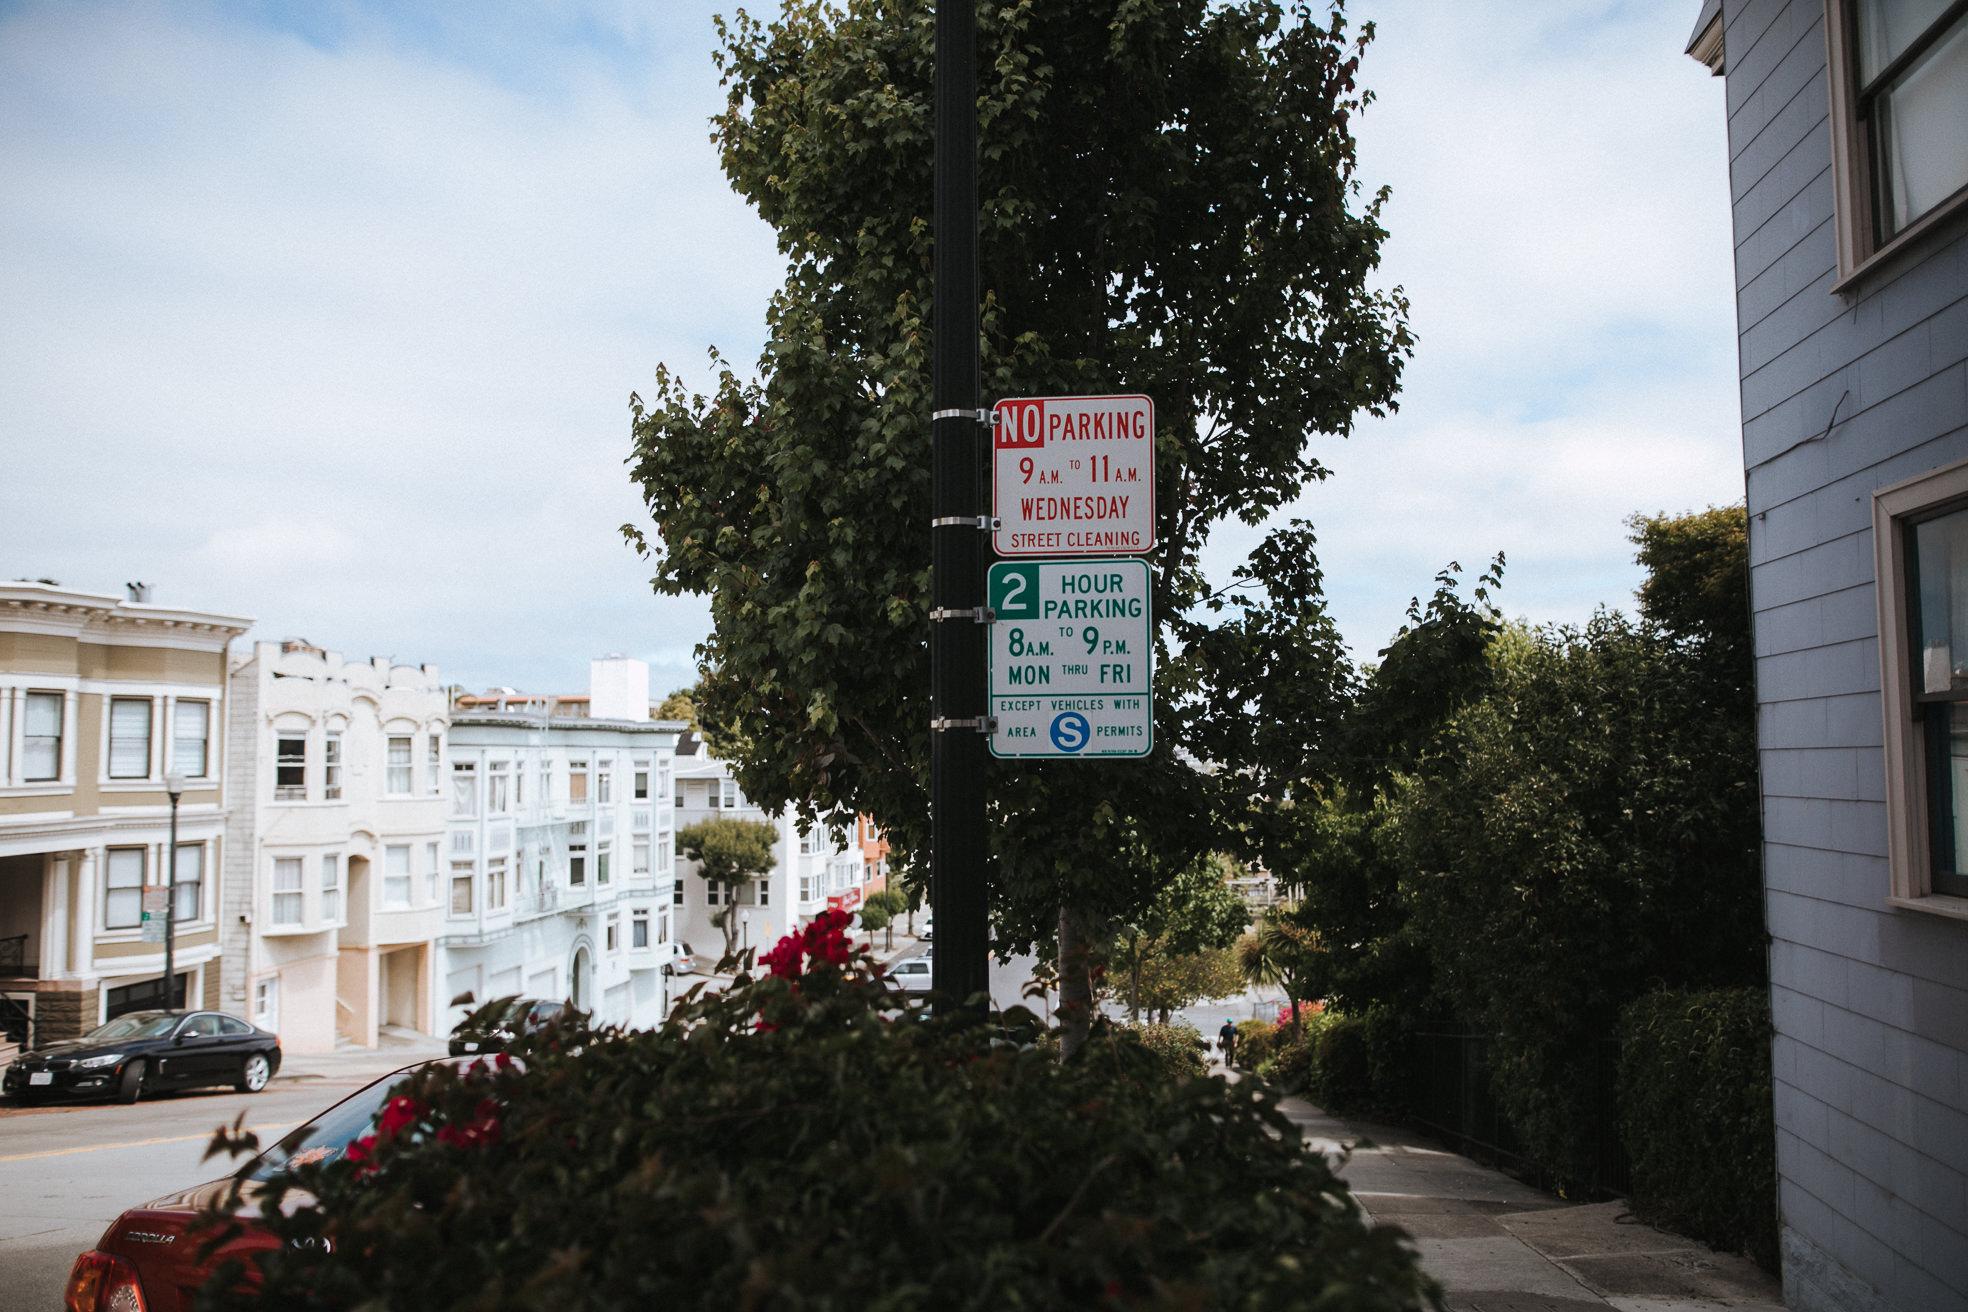 San-Francisco-BildervomLeben-4833